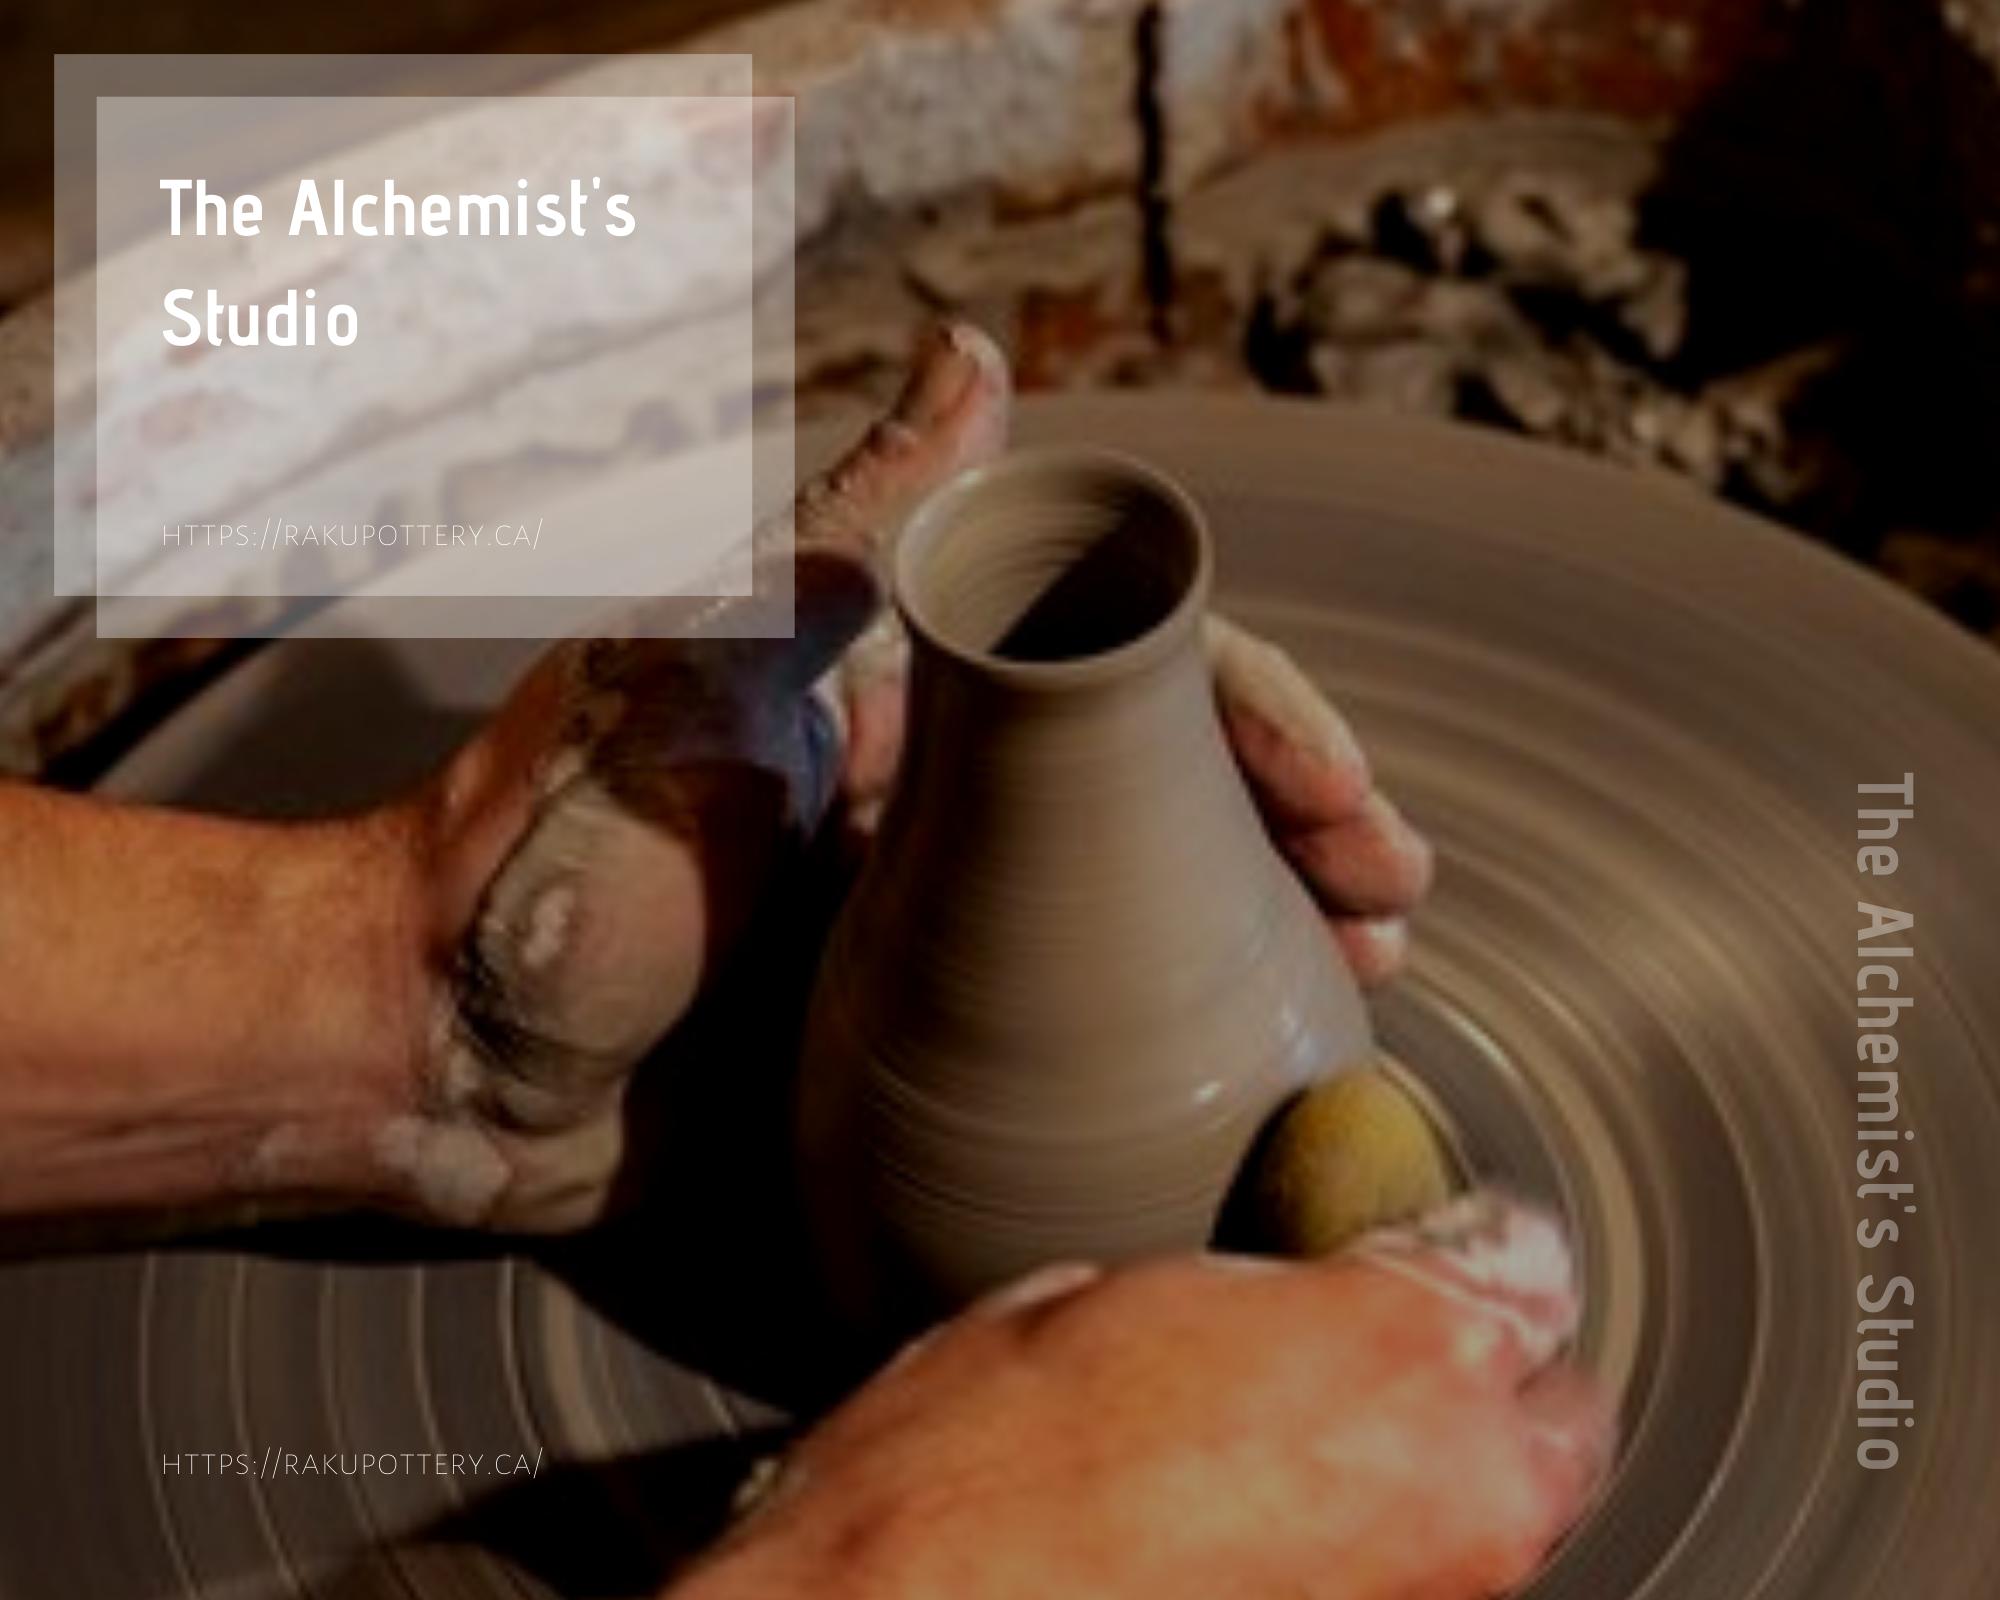 The Alchemist's Studio